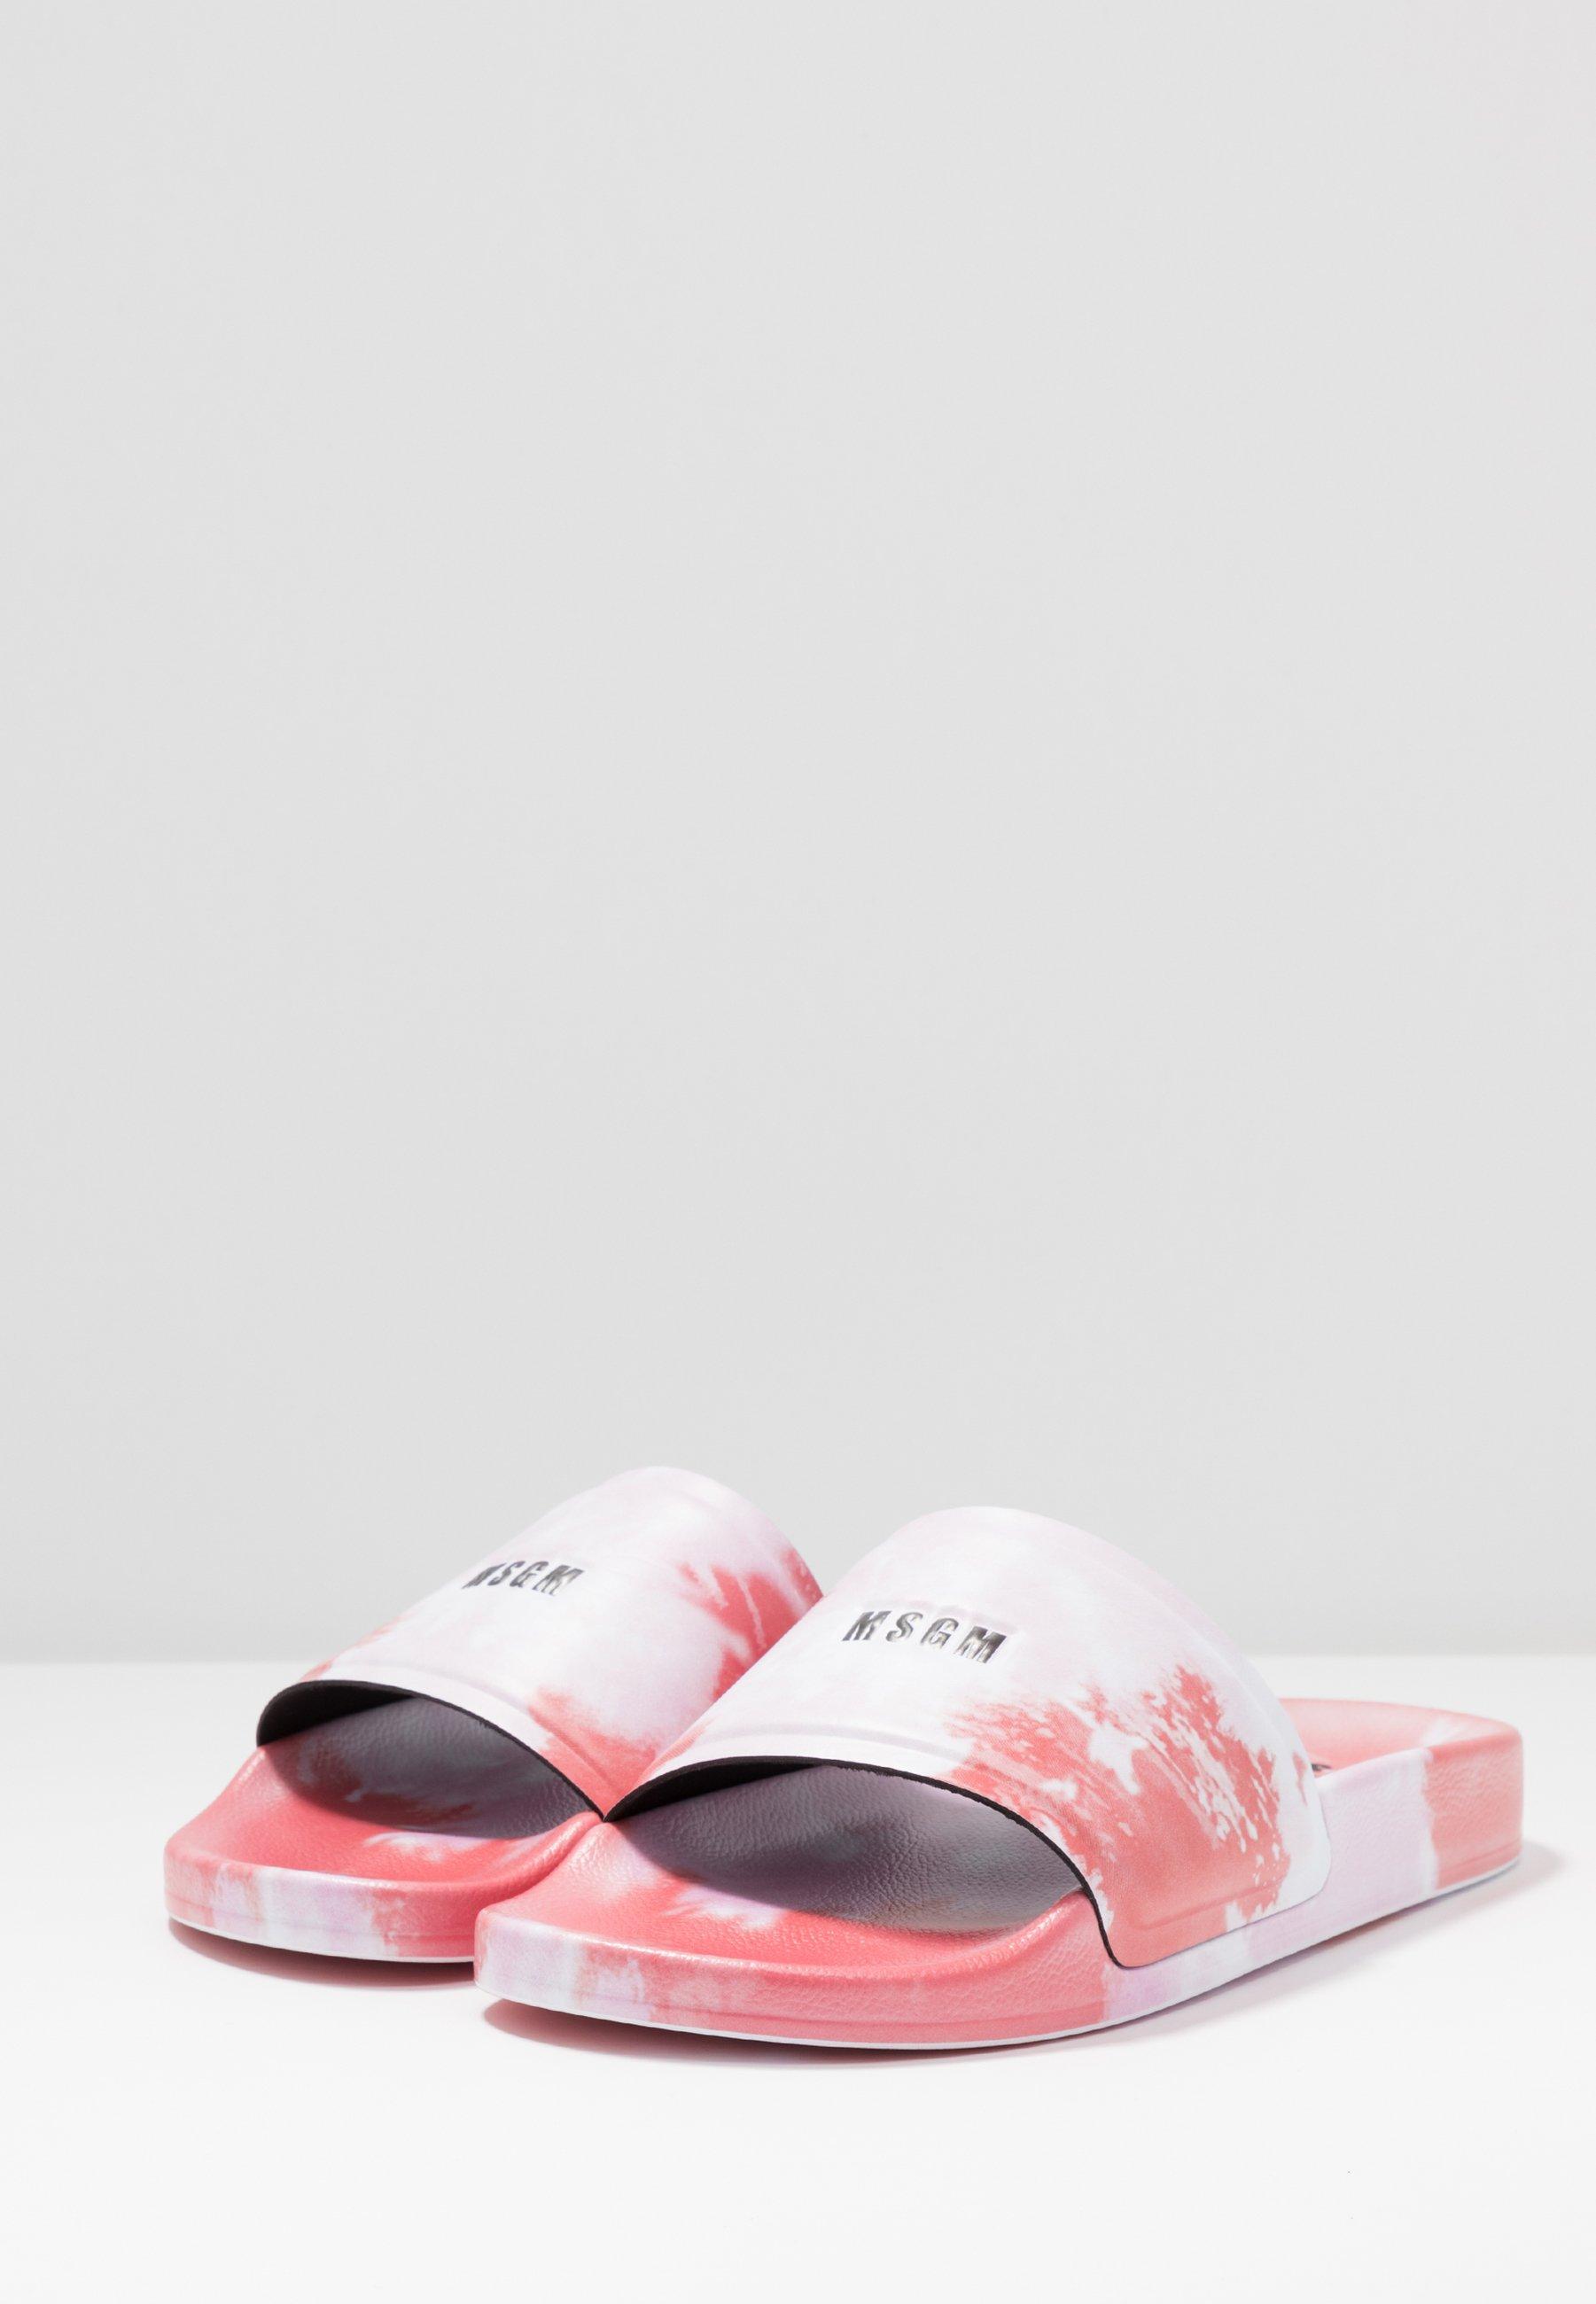 MSGM CIABATTA DONNA WOMANS SLIDE - Slip-ins - red/pink